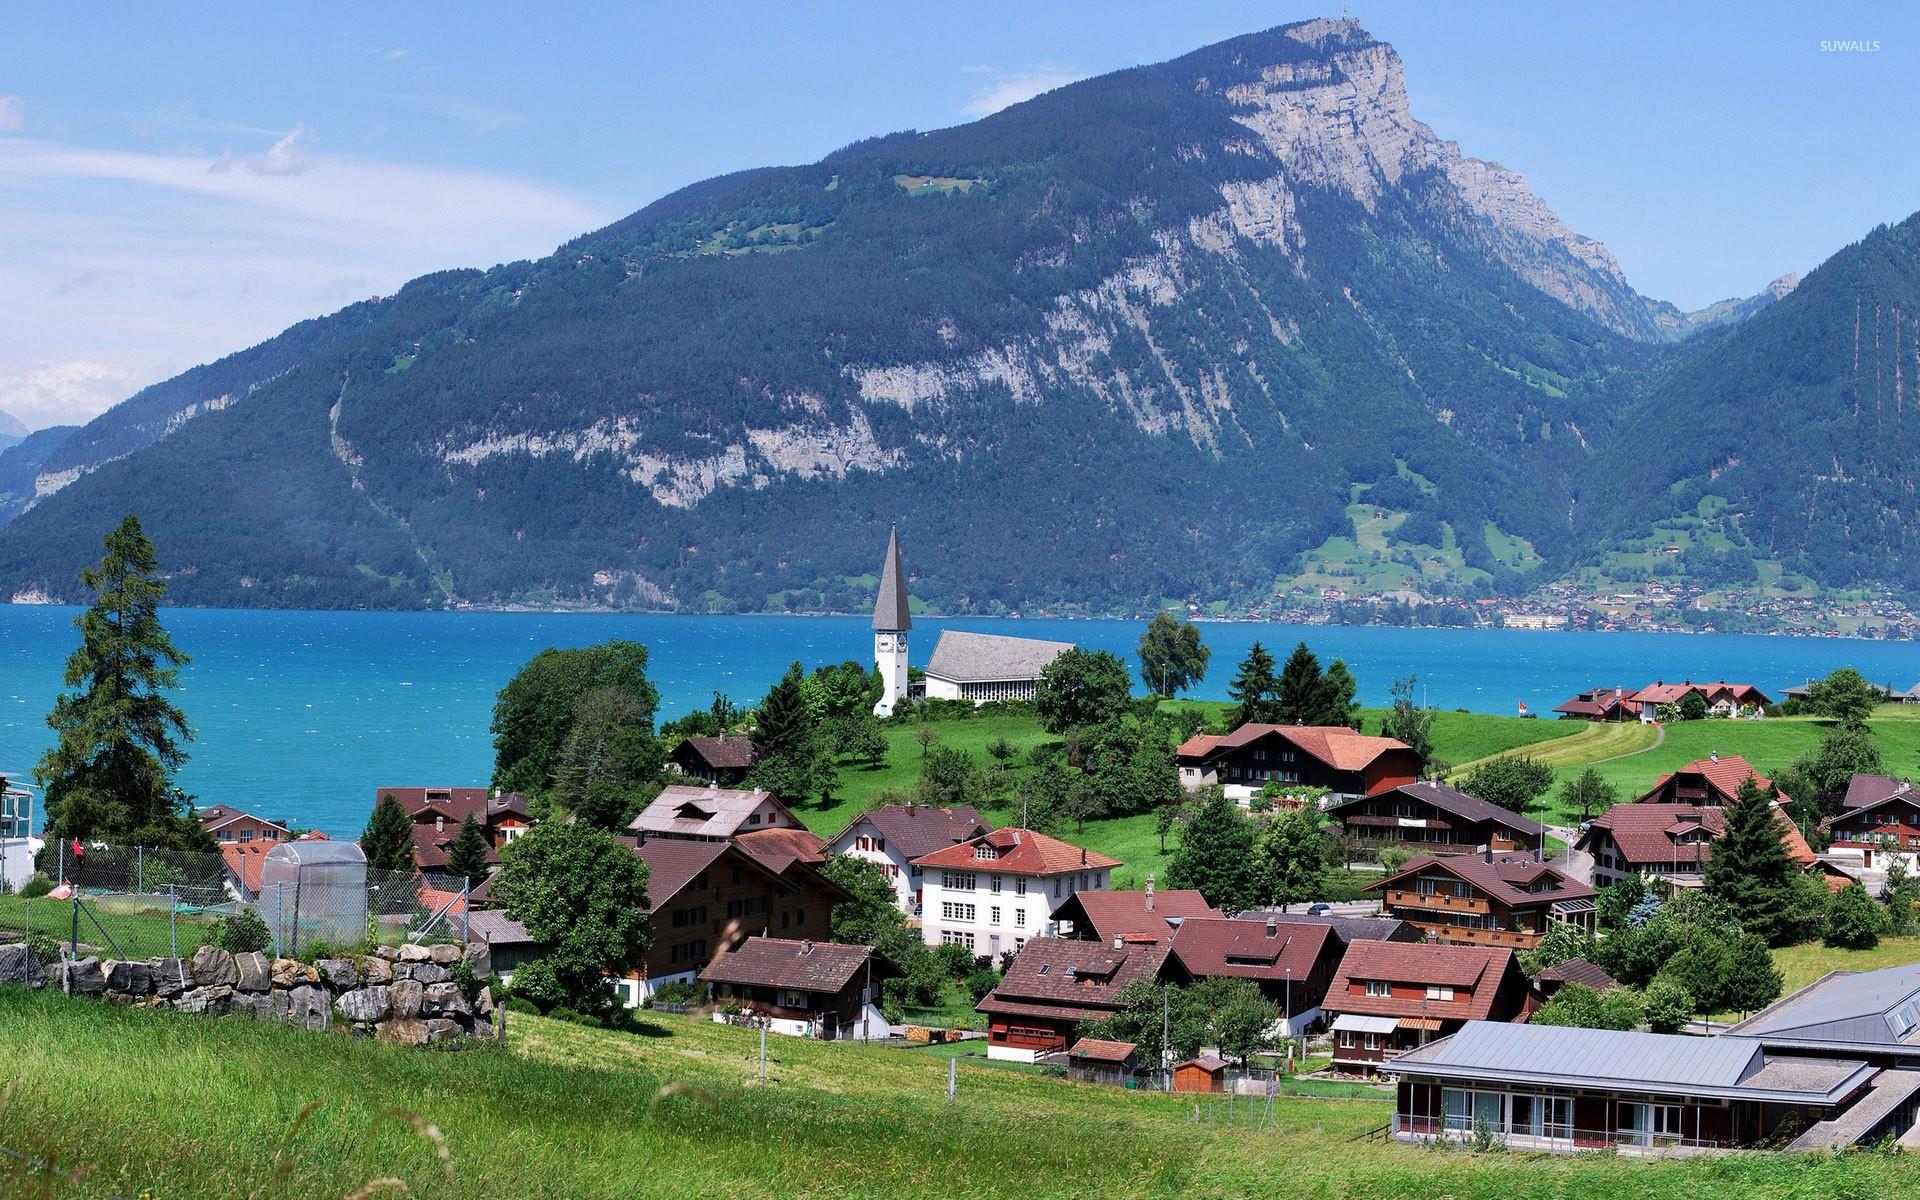 Small town by Lake Thun wallpaper jpg